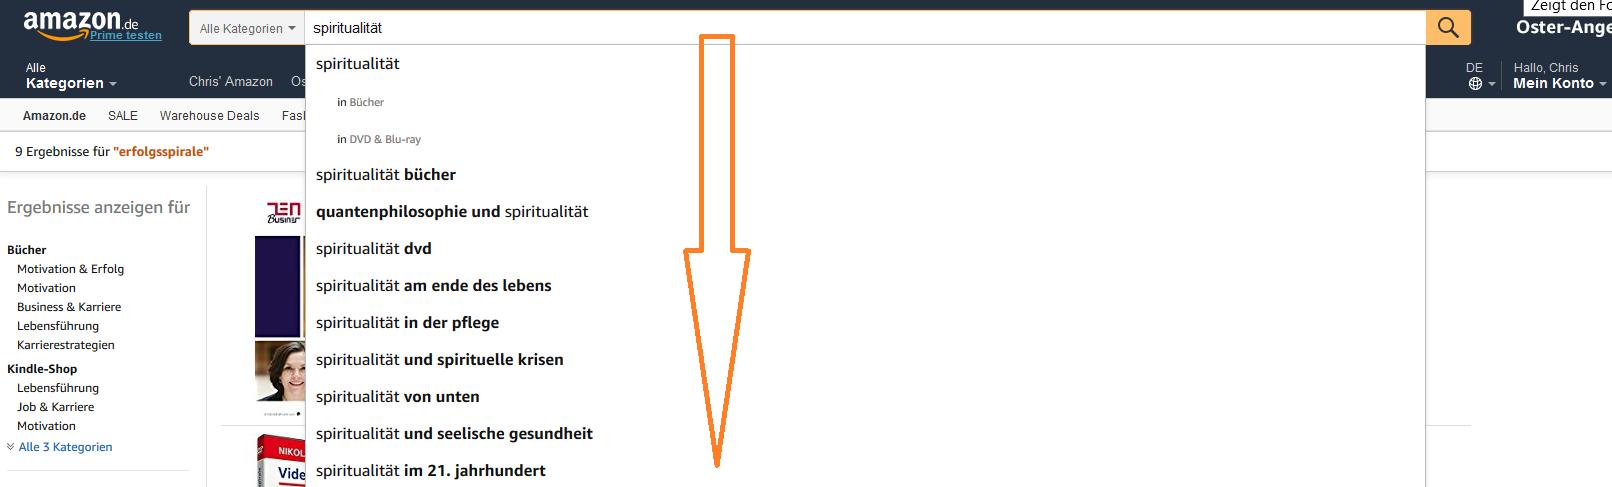 Keywordanalyse auf Amazon KDP 3 - shorttail Keyword Autocomplete